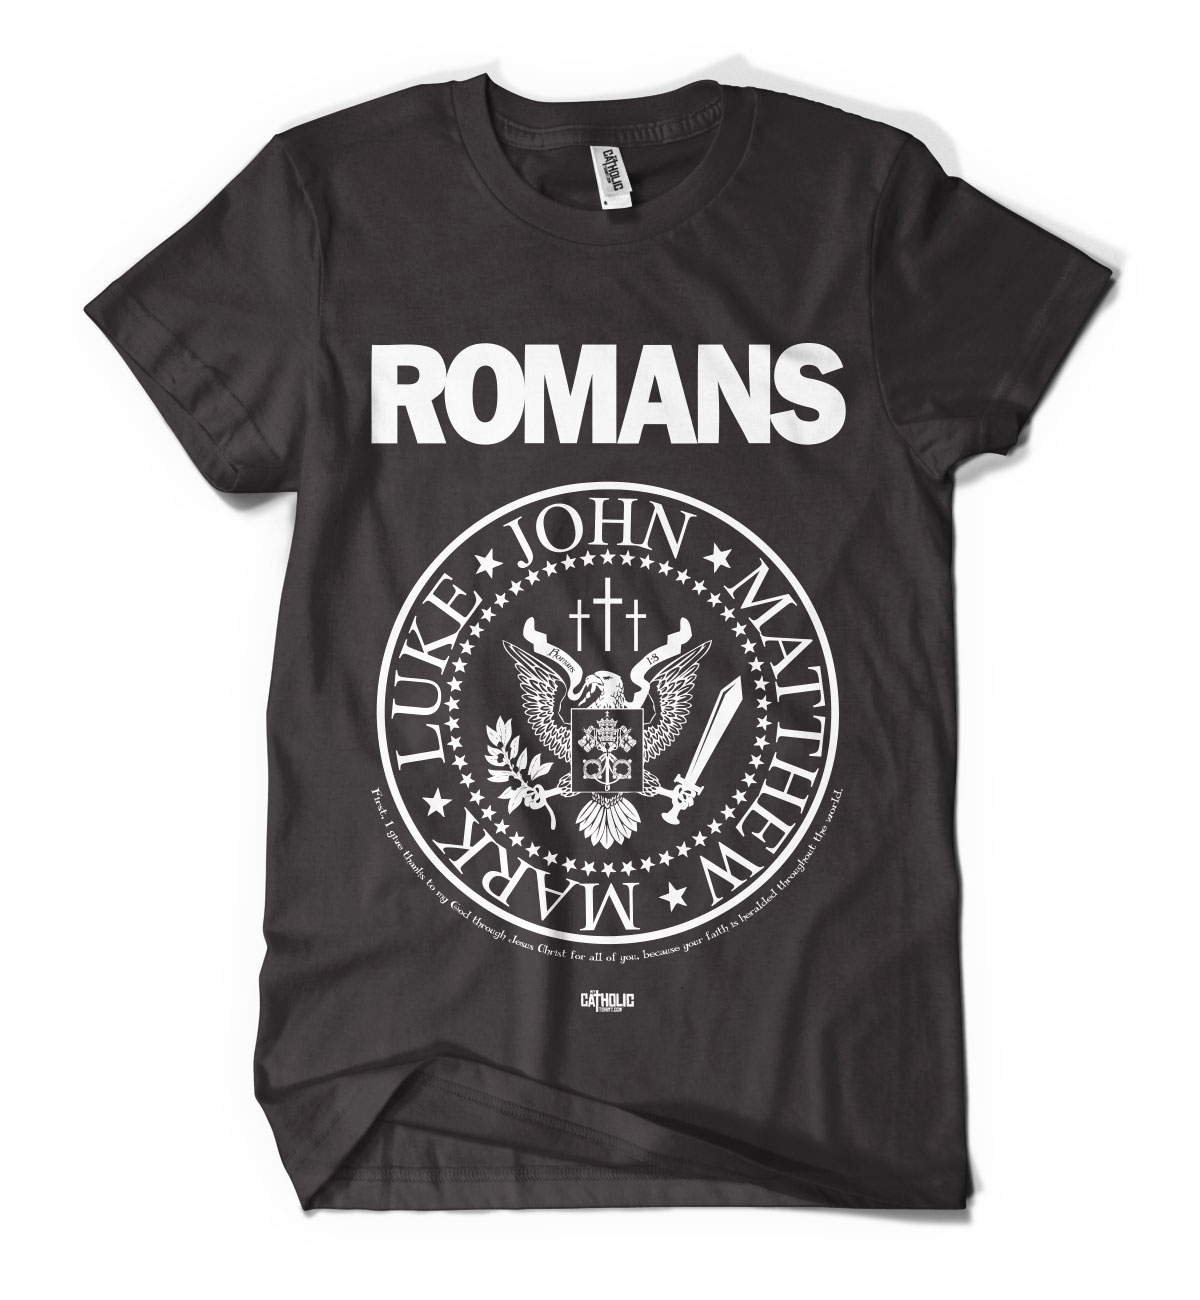 Romans Tshirt Catholic Christian T Shirt My Catholic